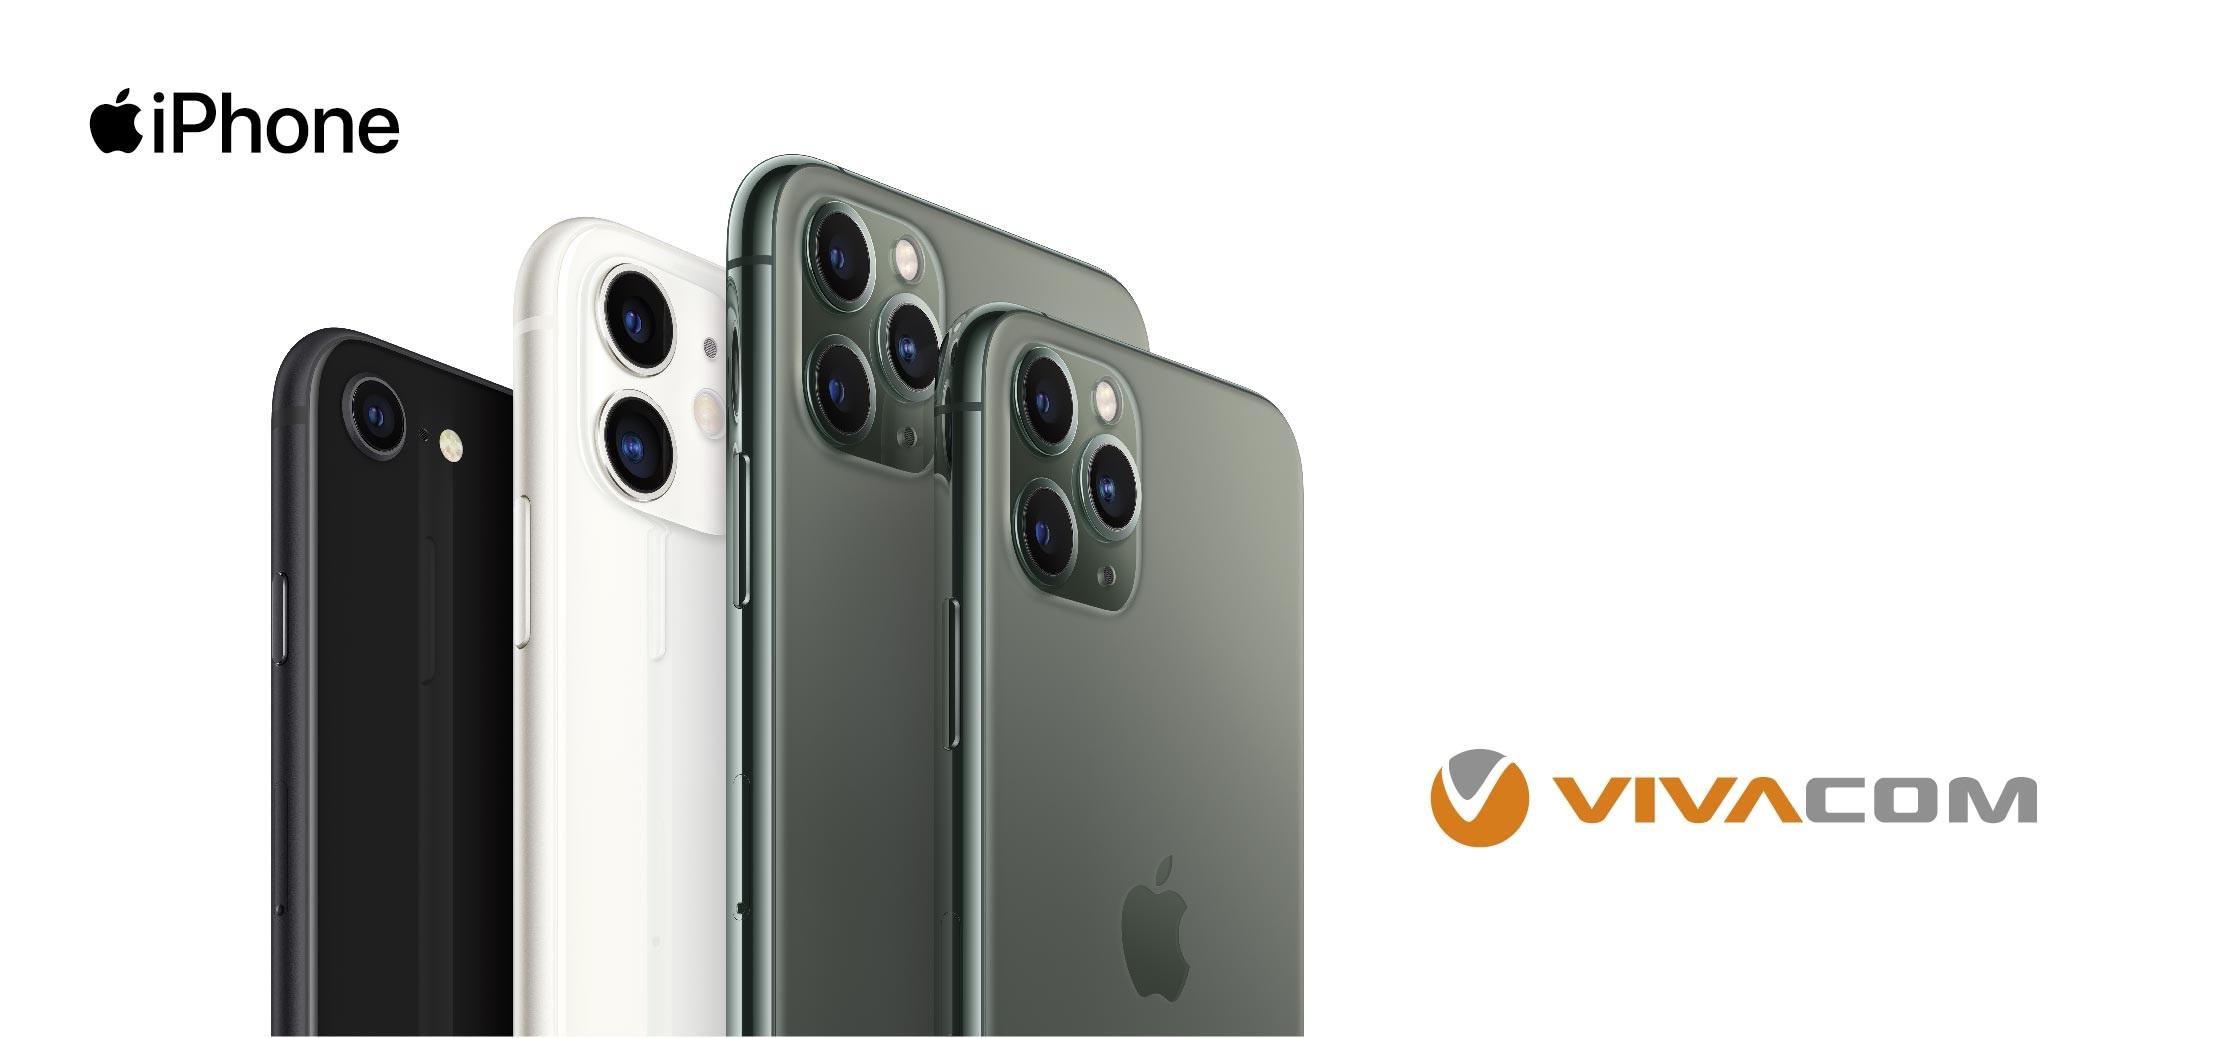 iphone-vivacom